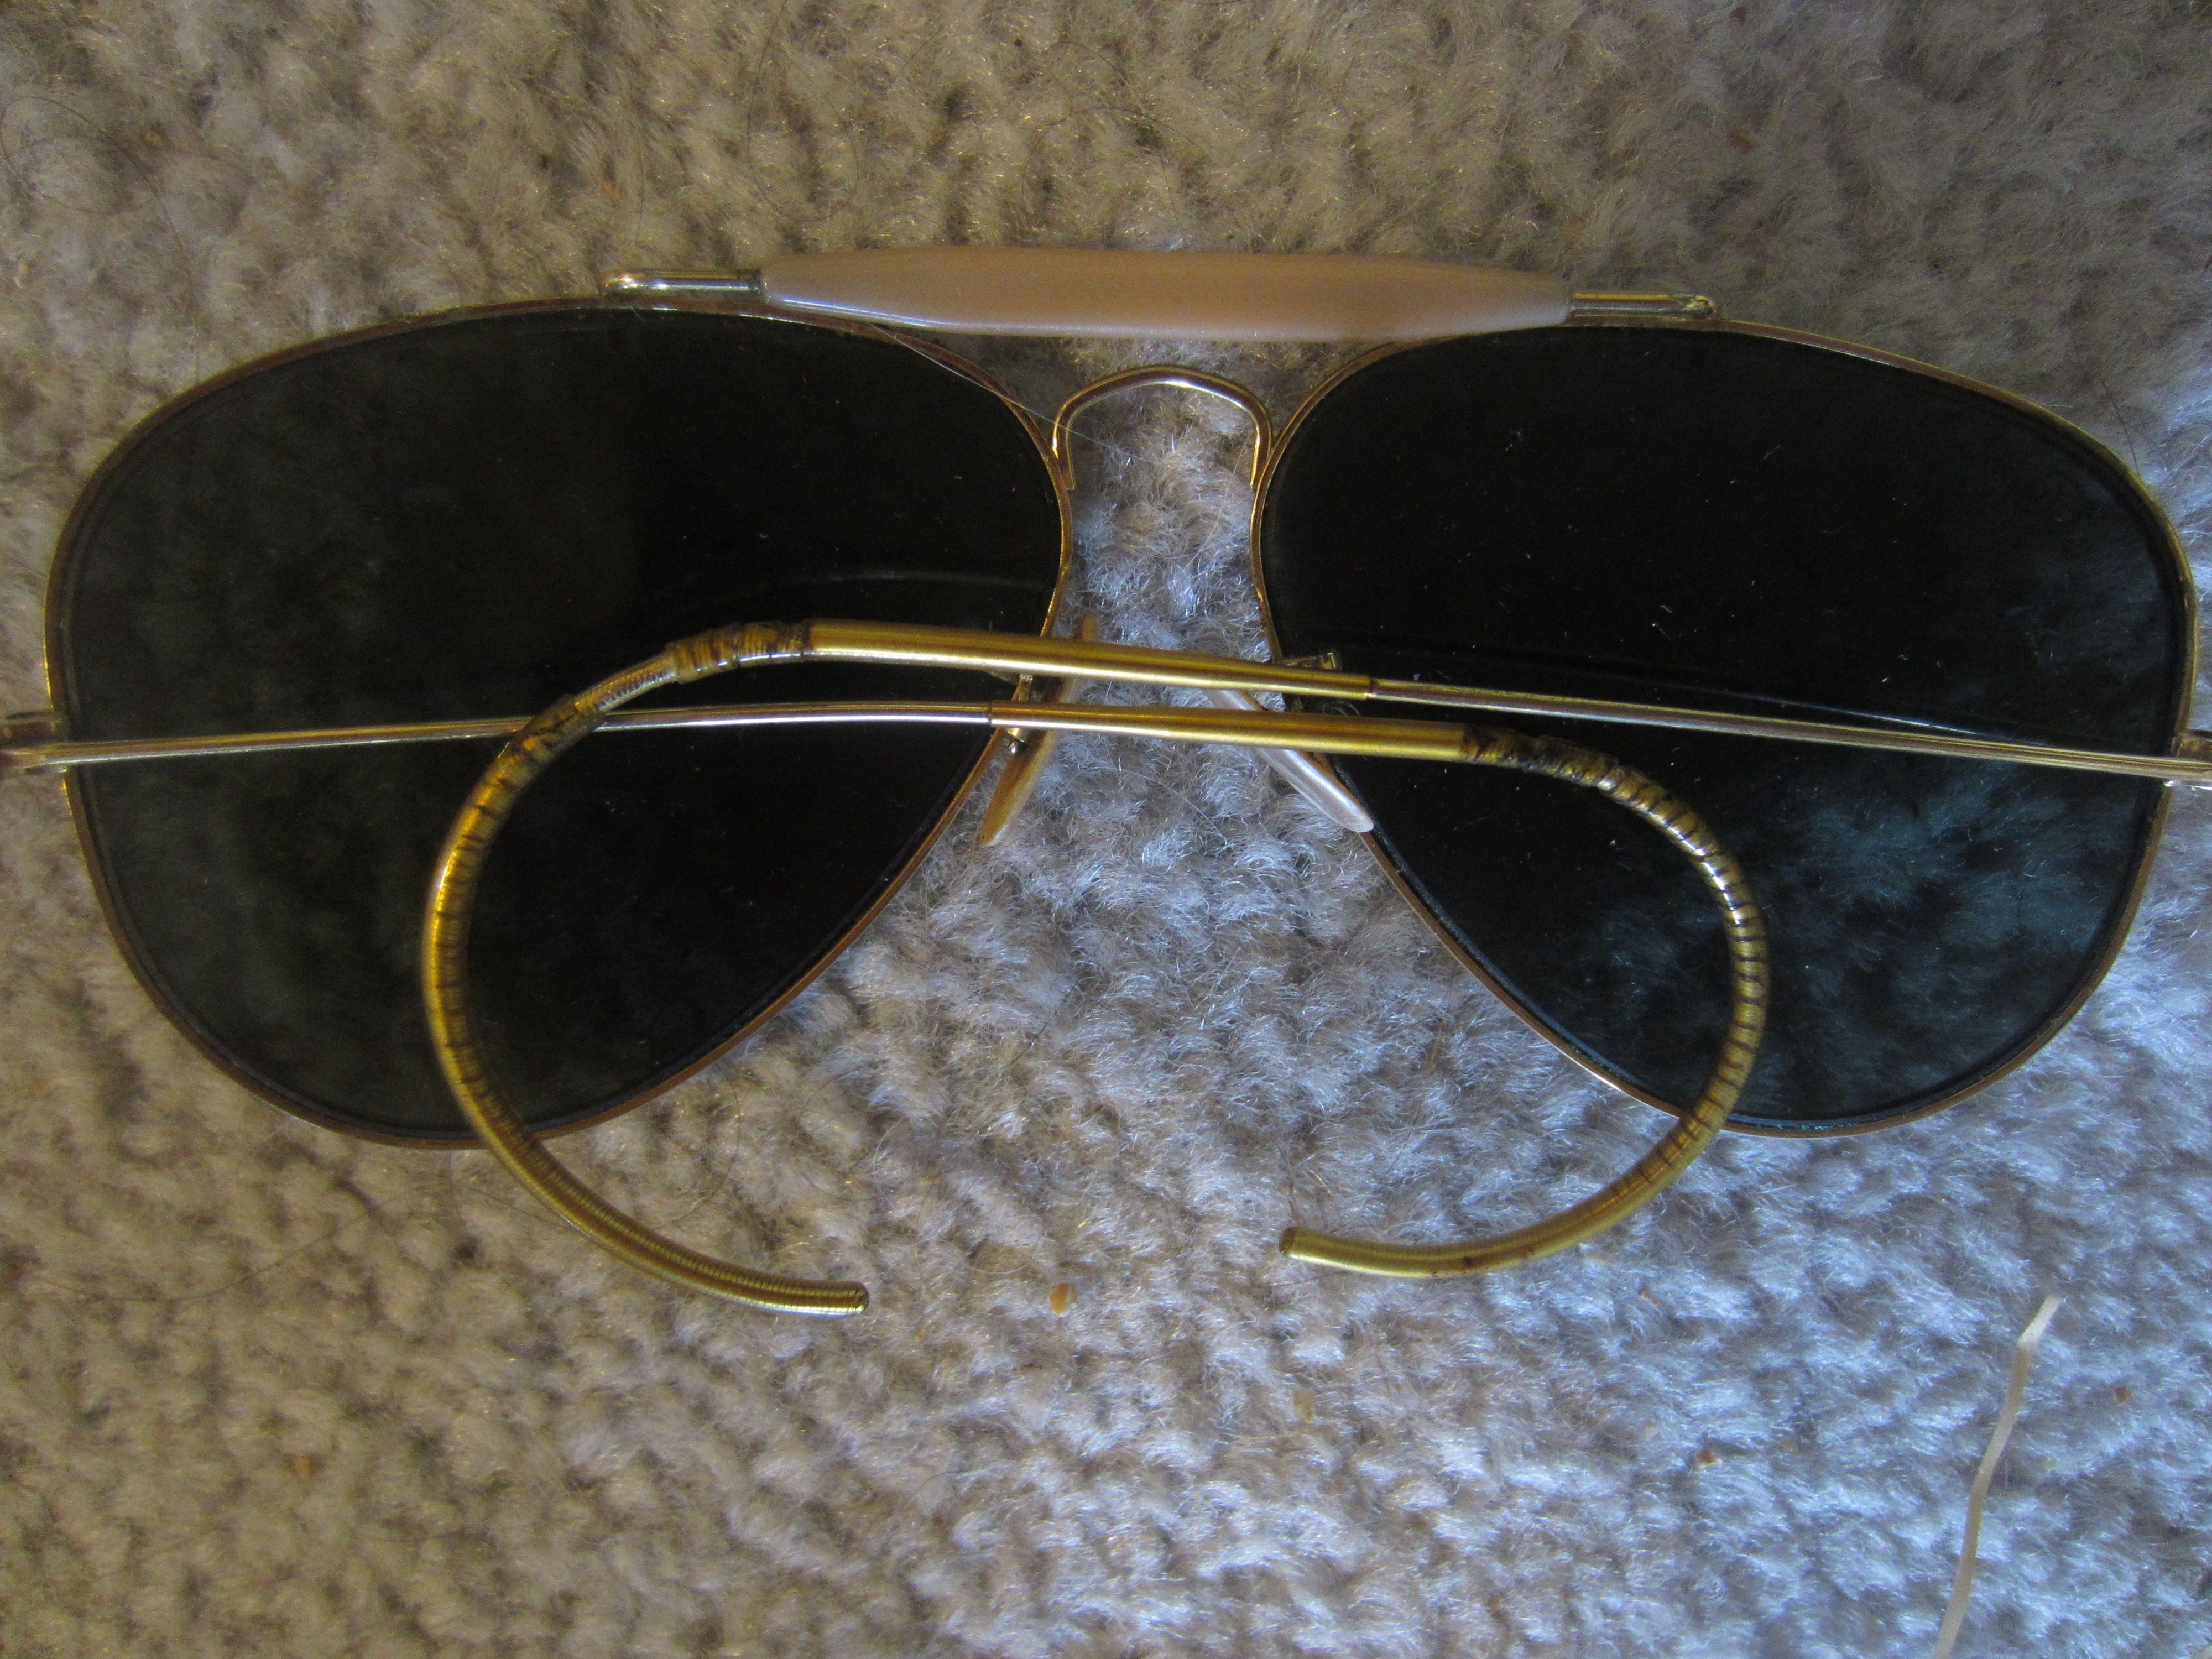 f928daeb6b11 RAY-BAN vintage OUTDOORSMAN gold AVIATOR SUNGLASSES & CASE BAUSCH & LOMB  green lens